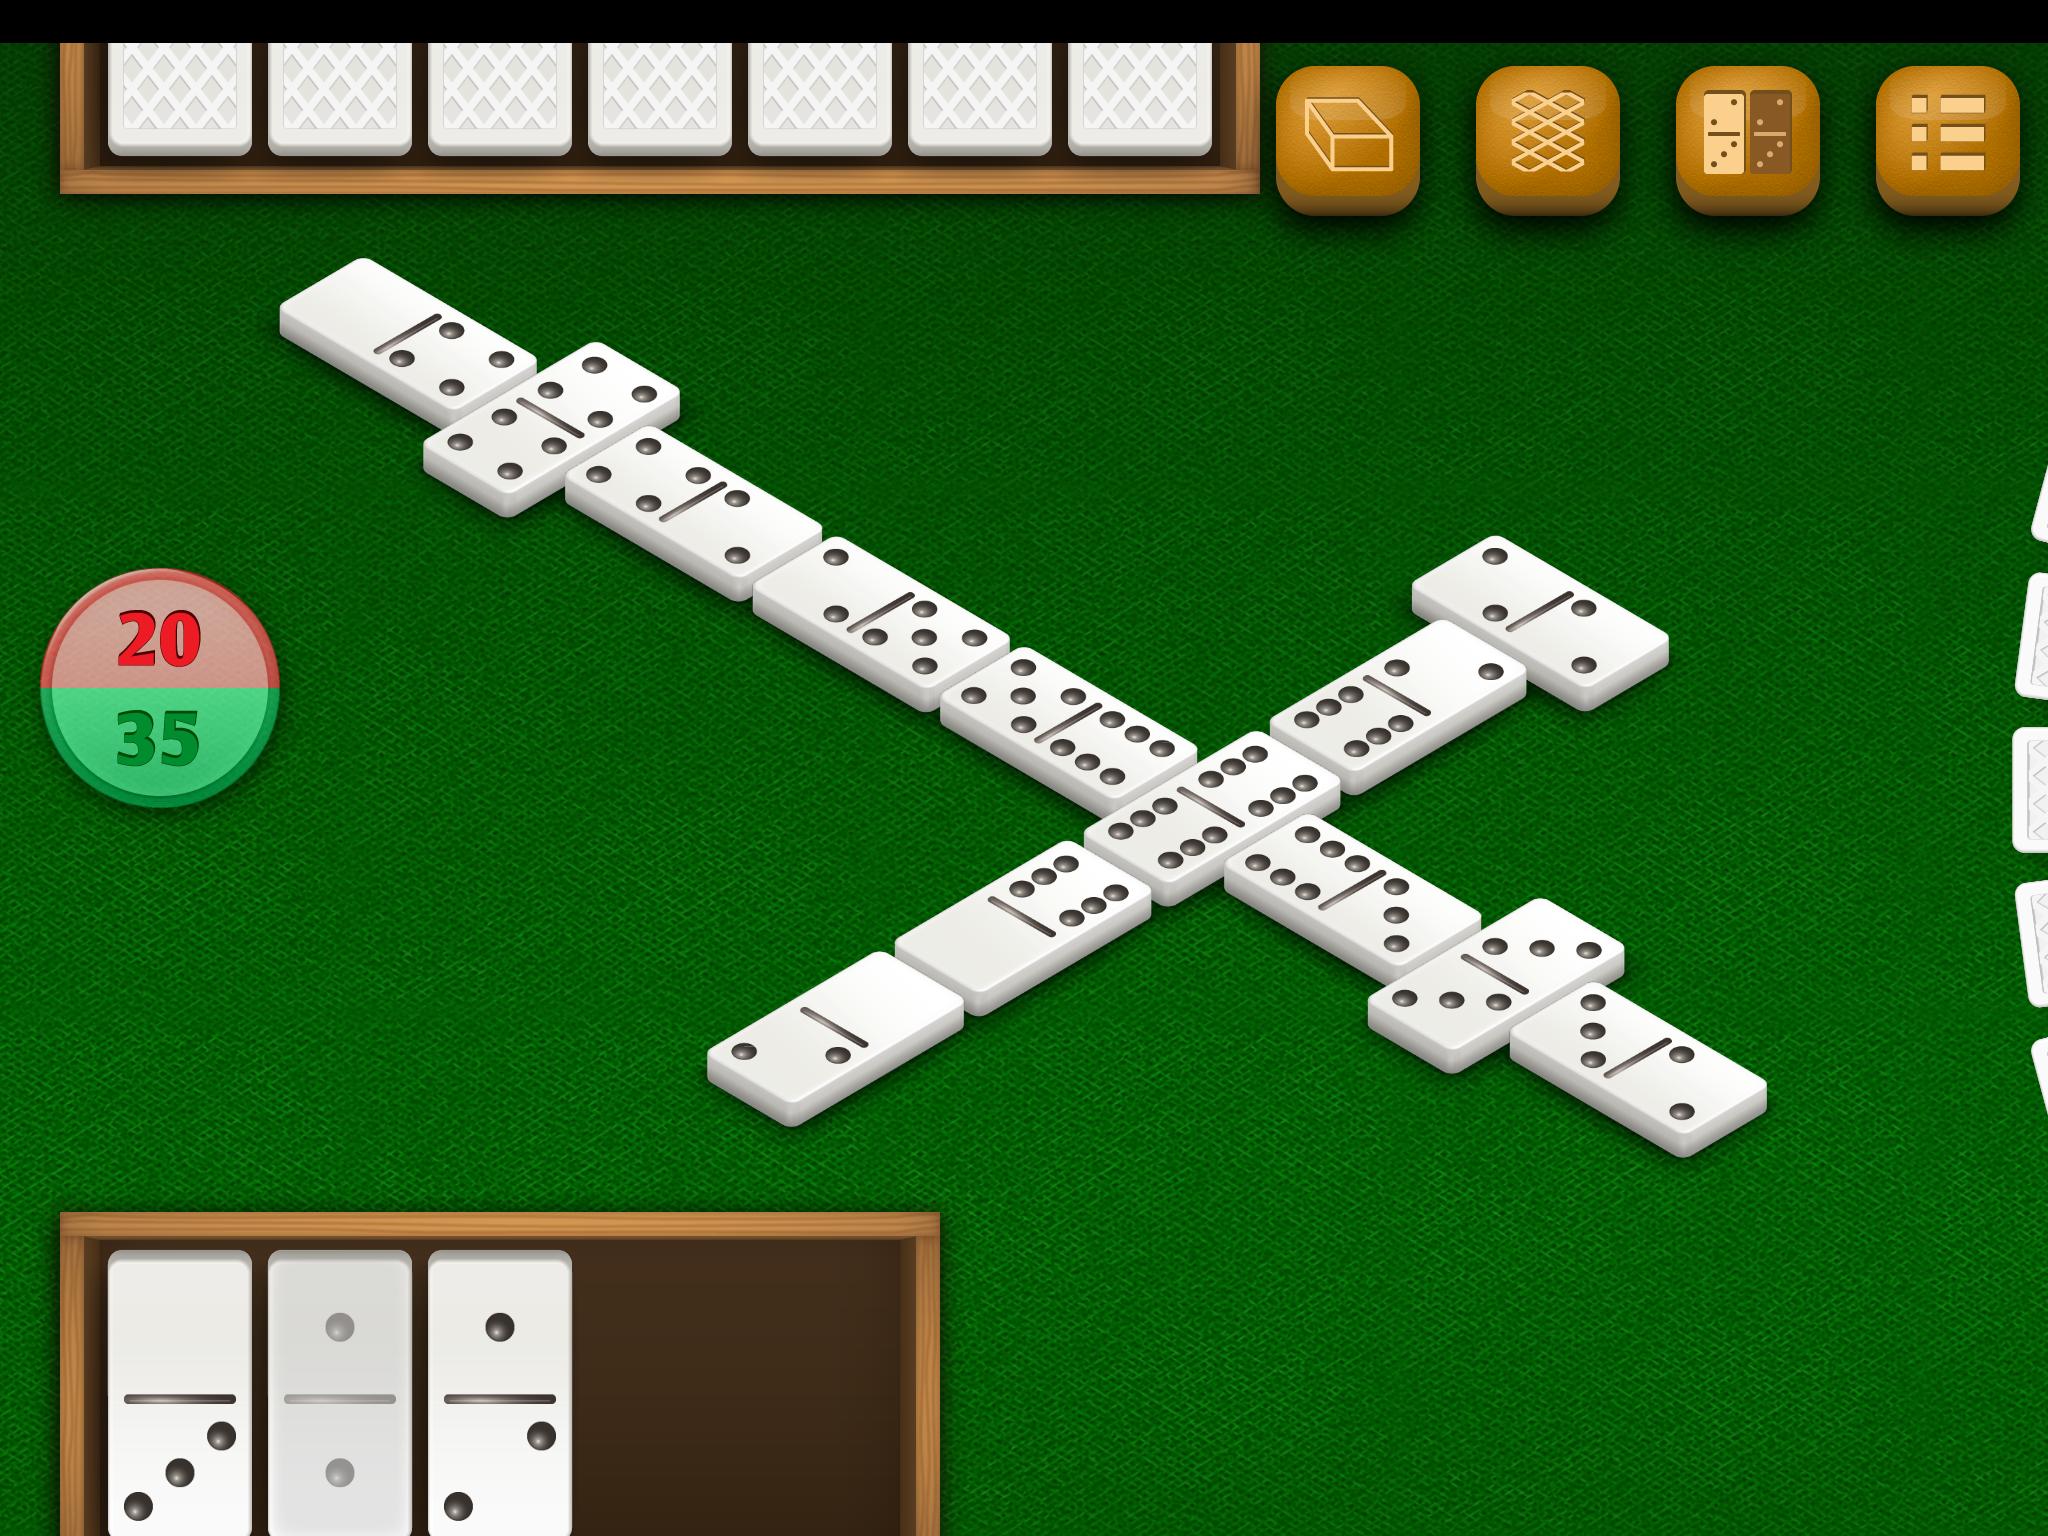 Dominos by DoraLogic, dementia-friendly app (alternative display 1)